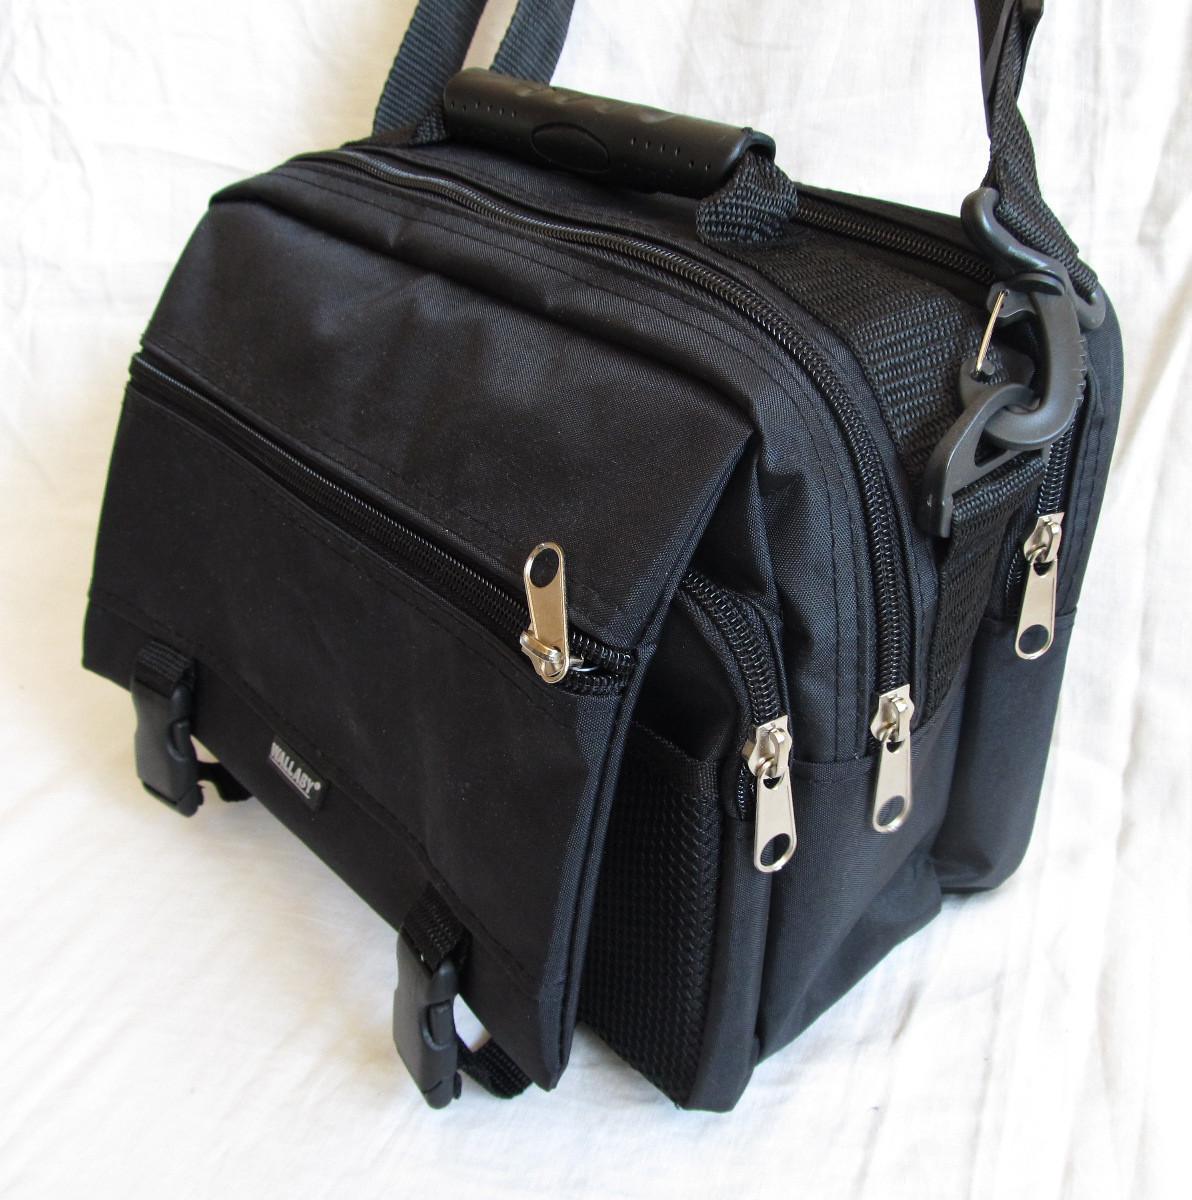 d495d95ffc26 Мужская сумка Wallaby2425 черная барсетка через плечо 28х21х16см -  Интернет-магазин